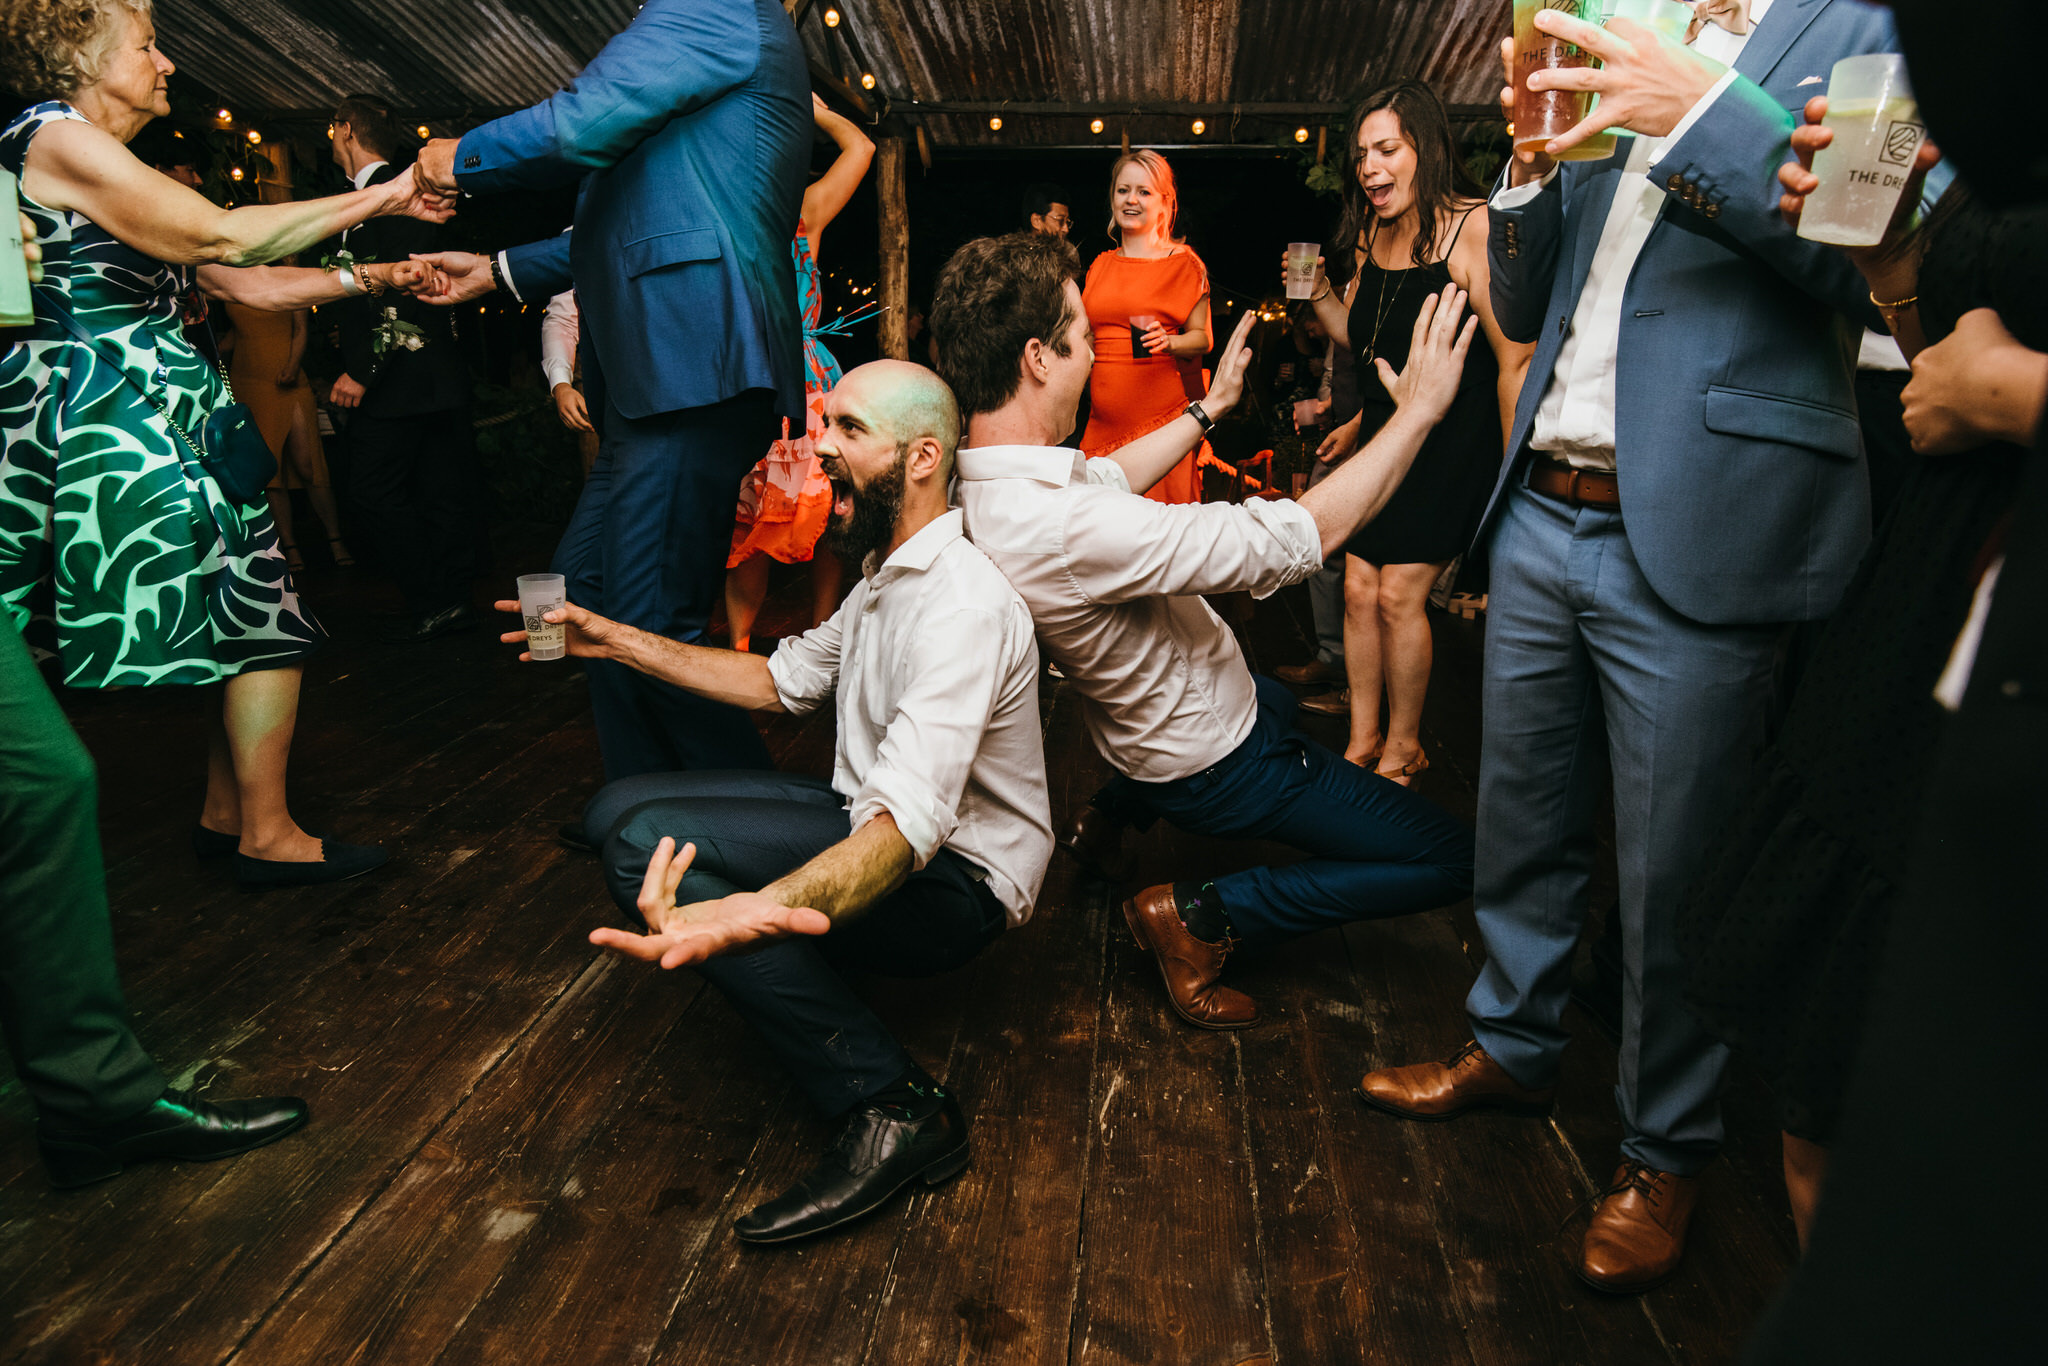 Dancing at The dreys kent